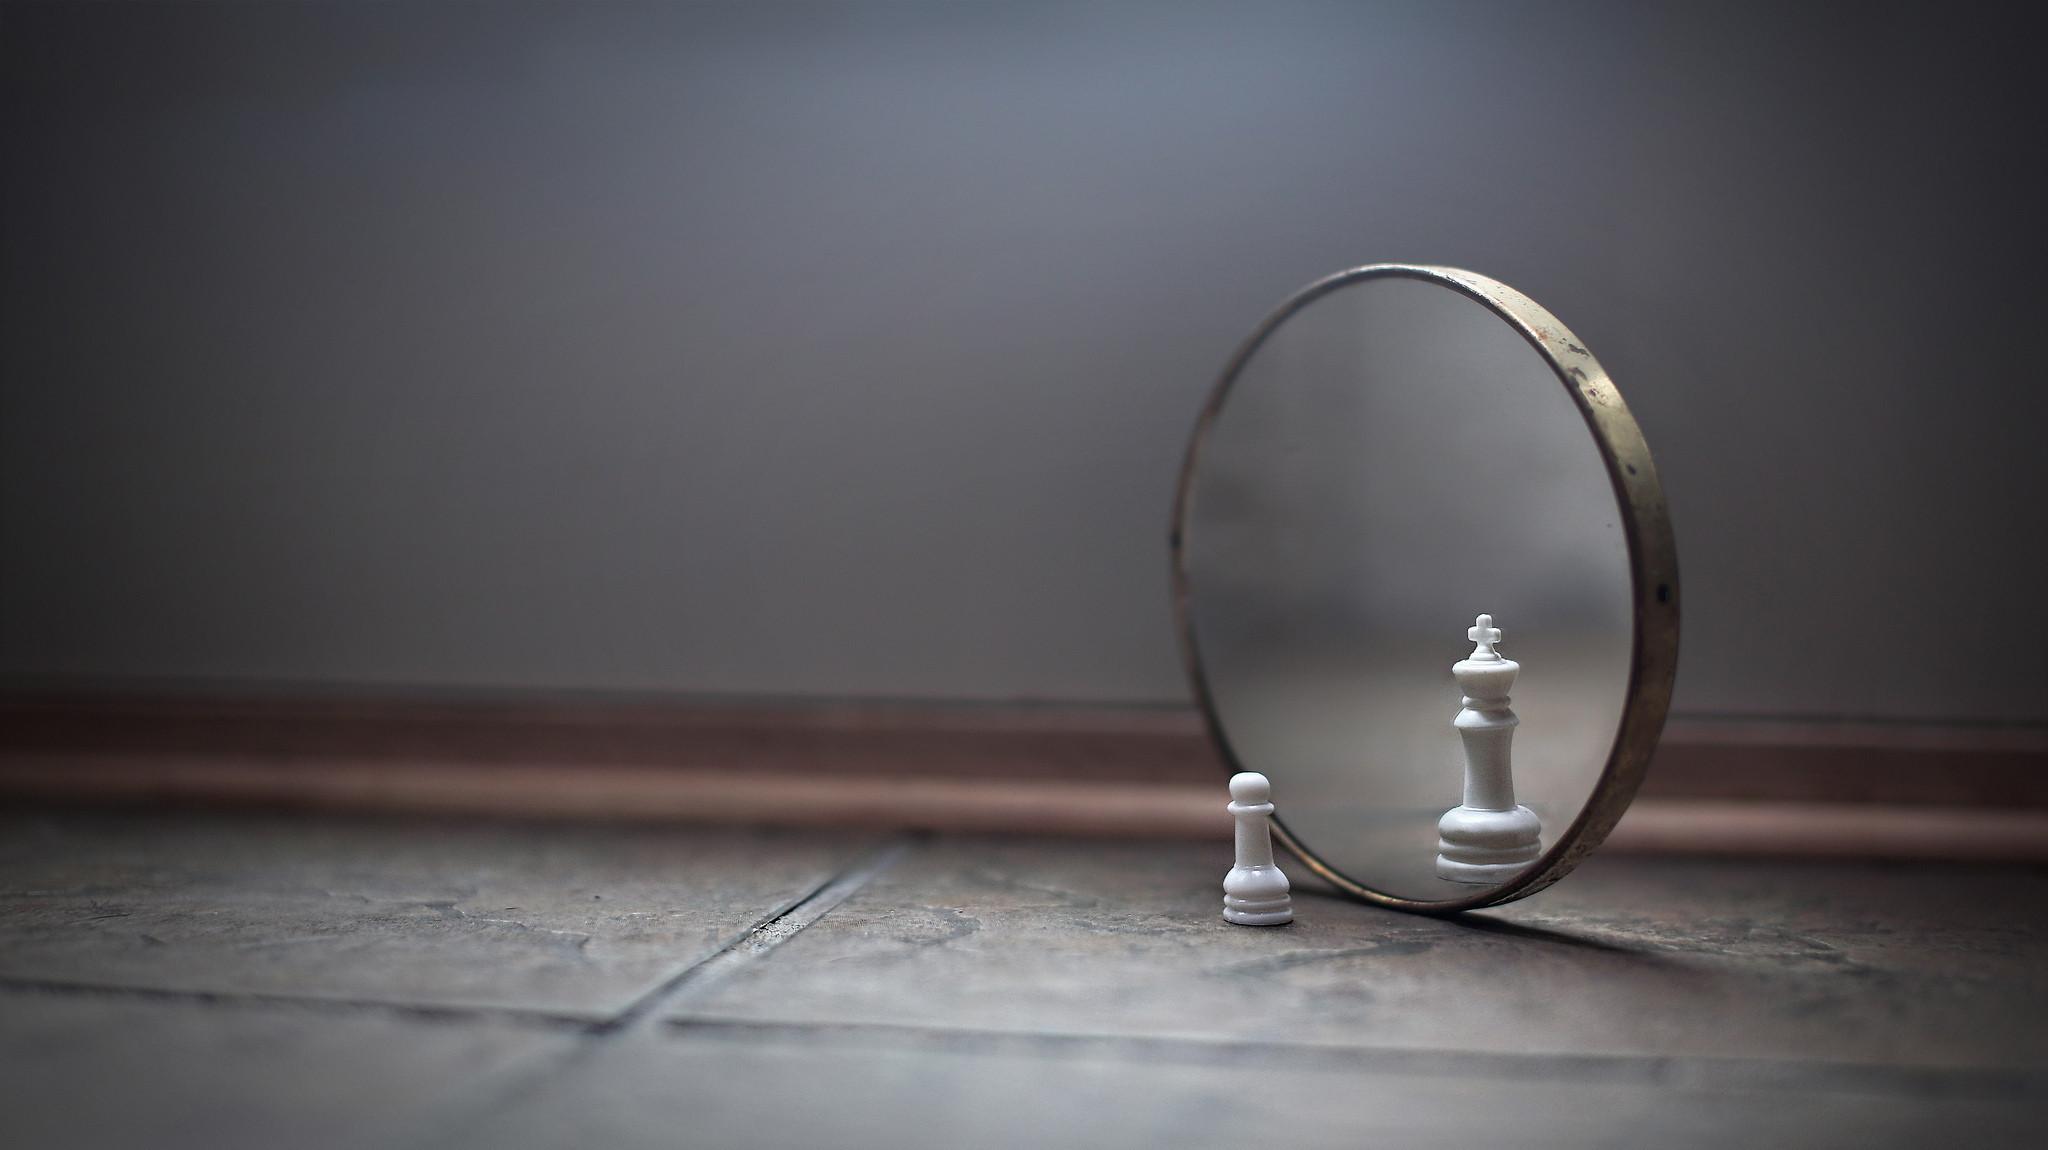 Амбиции шахматы мотивация зеркало амбиции